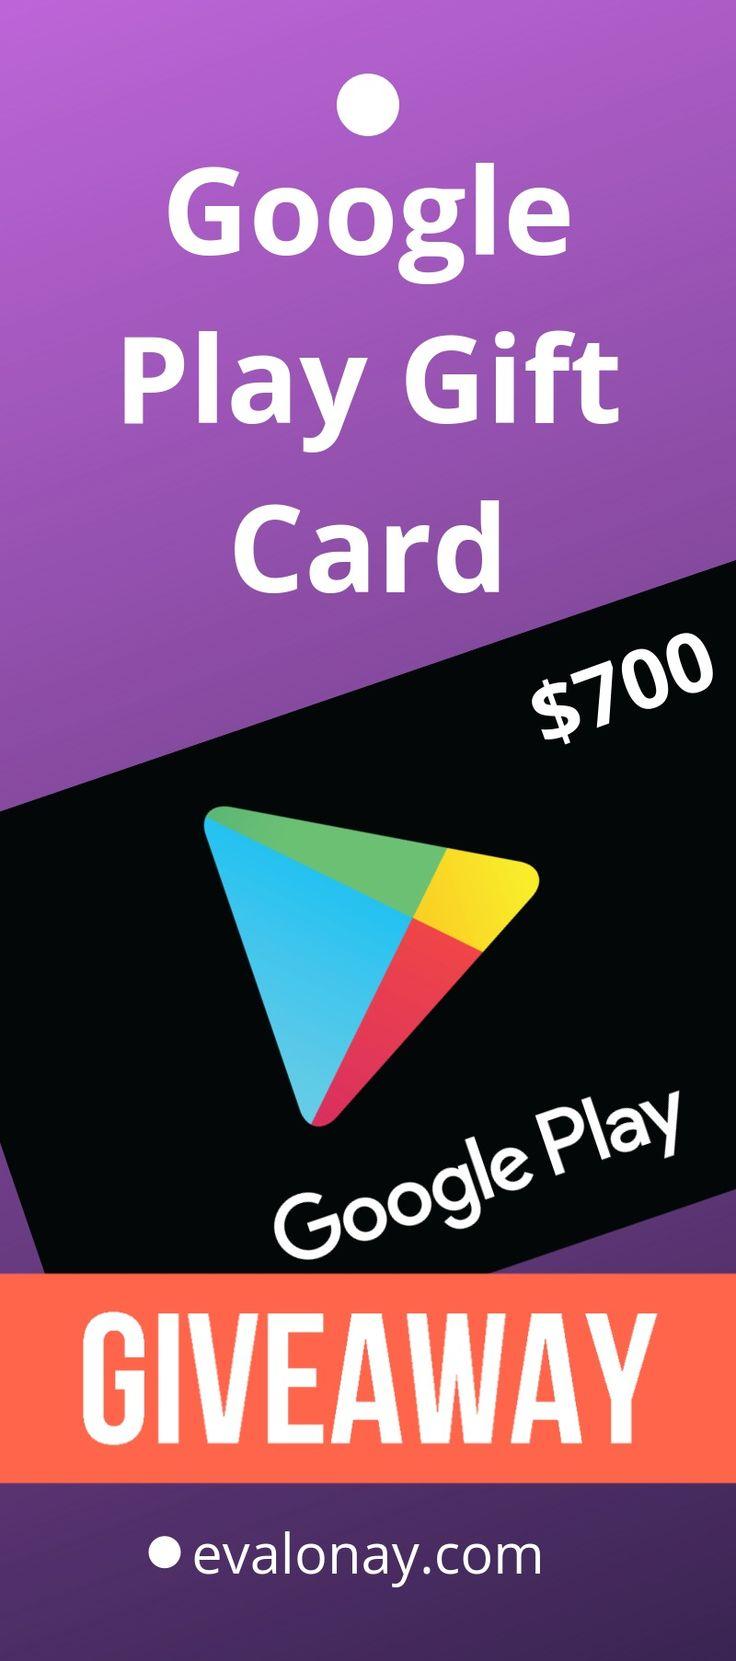 Giveaway google play gift card google play gift card